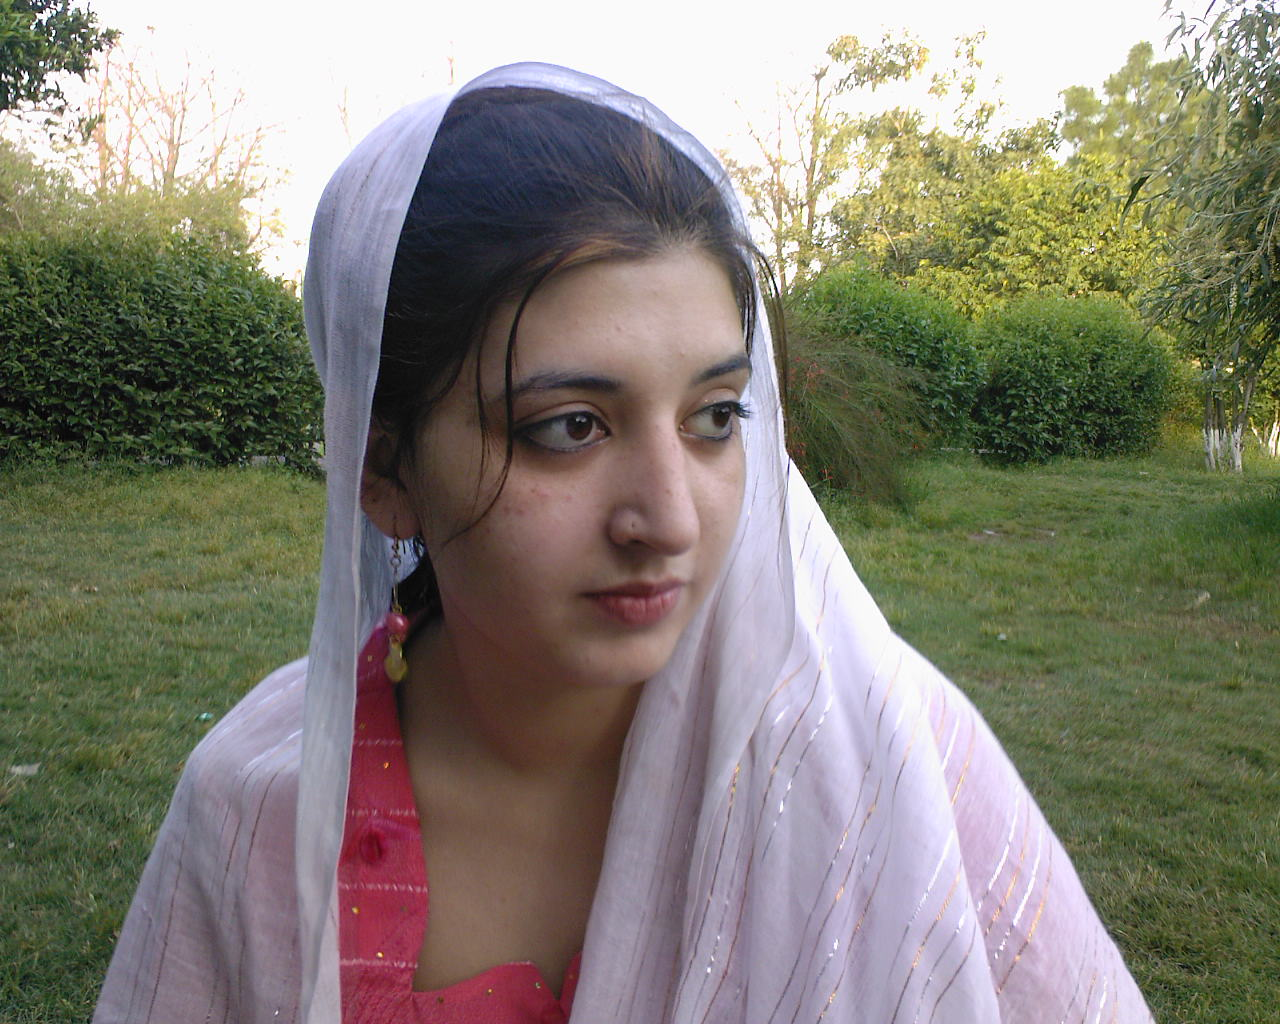 hd simple wallpapers: hot pakistani simple girls